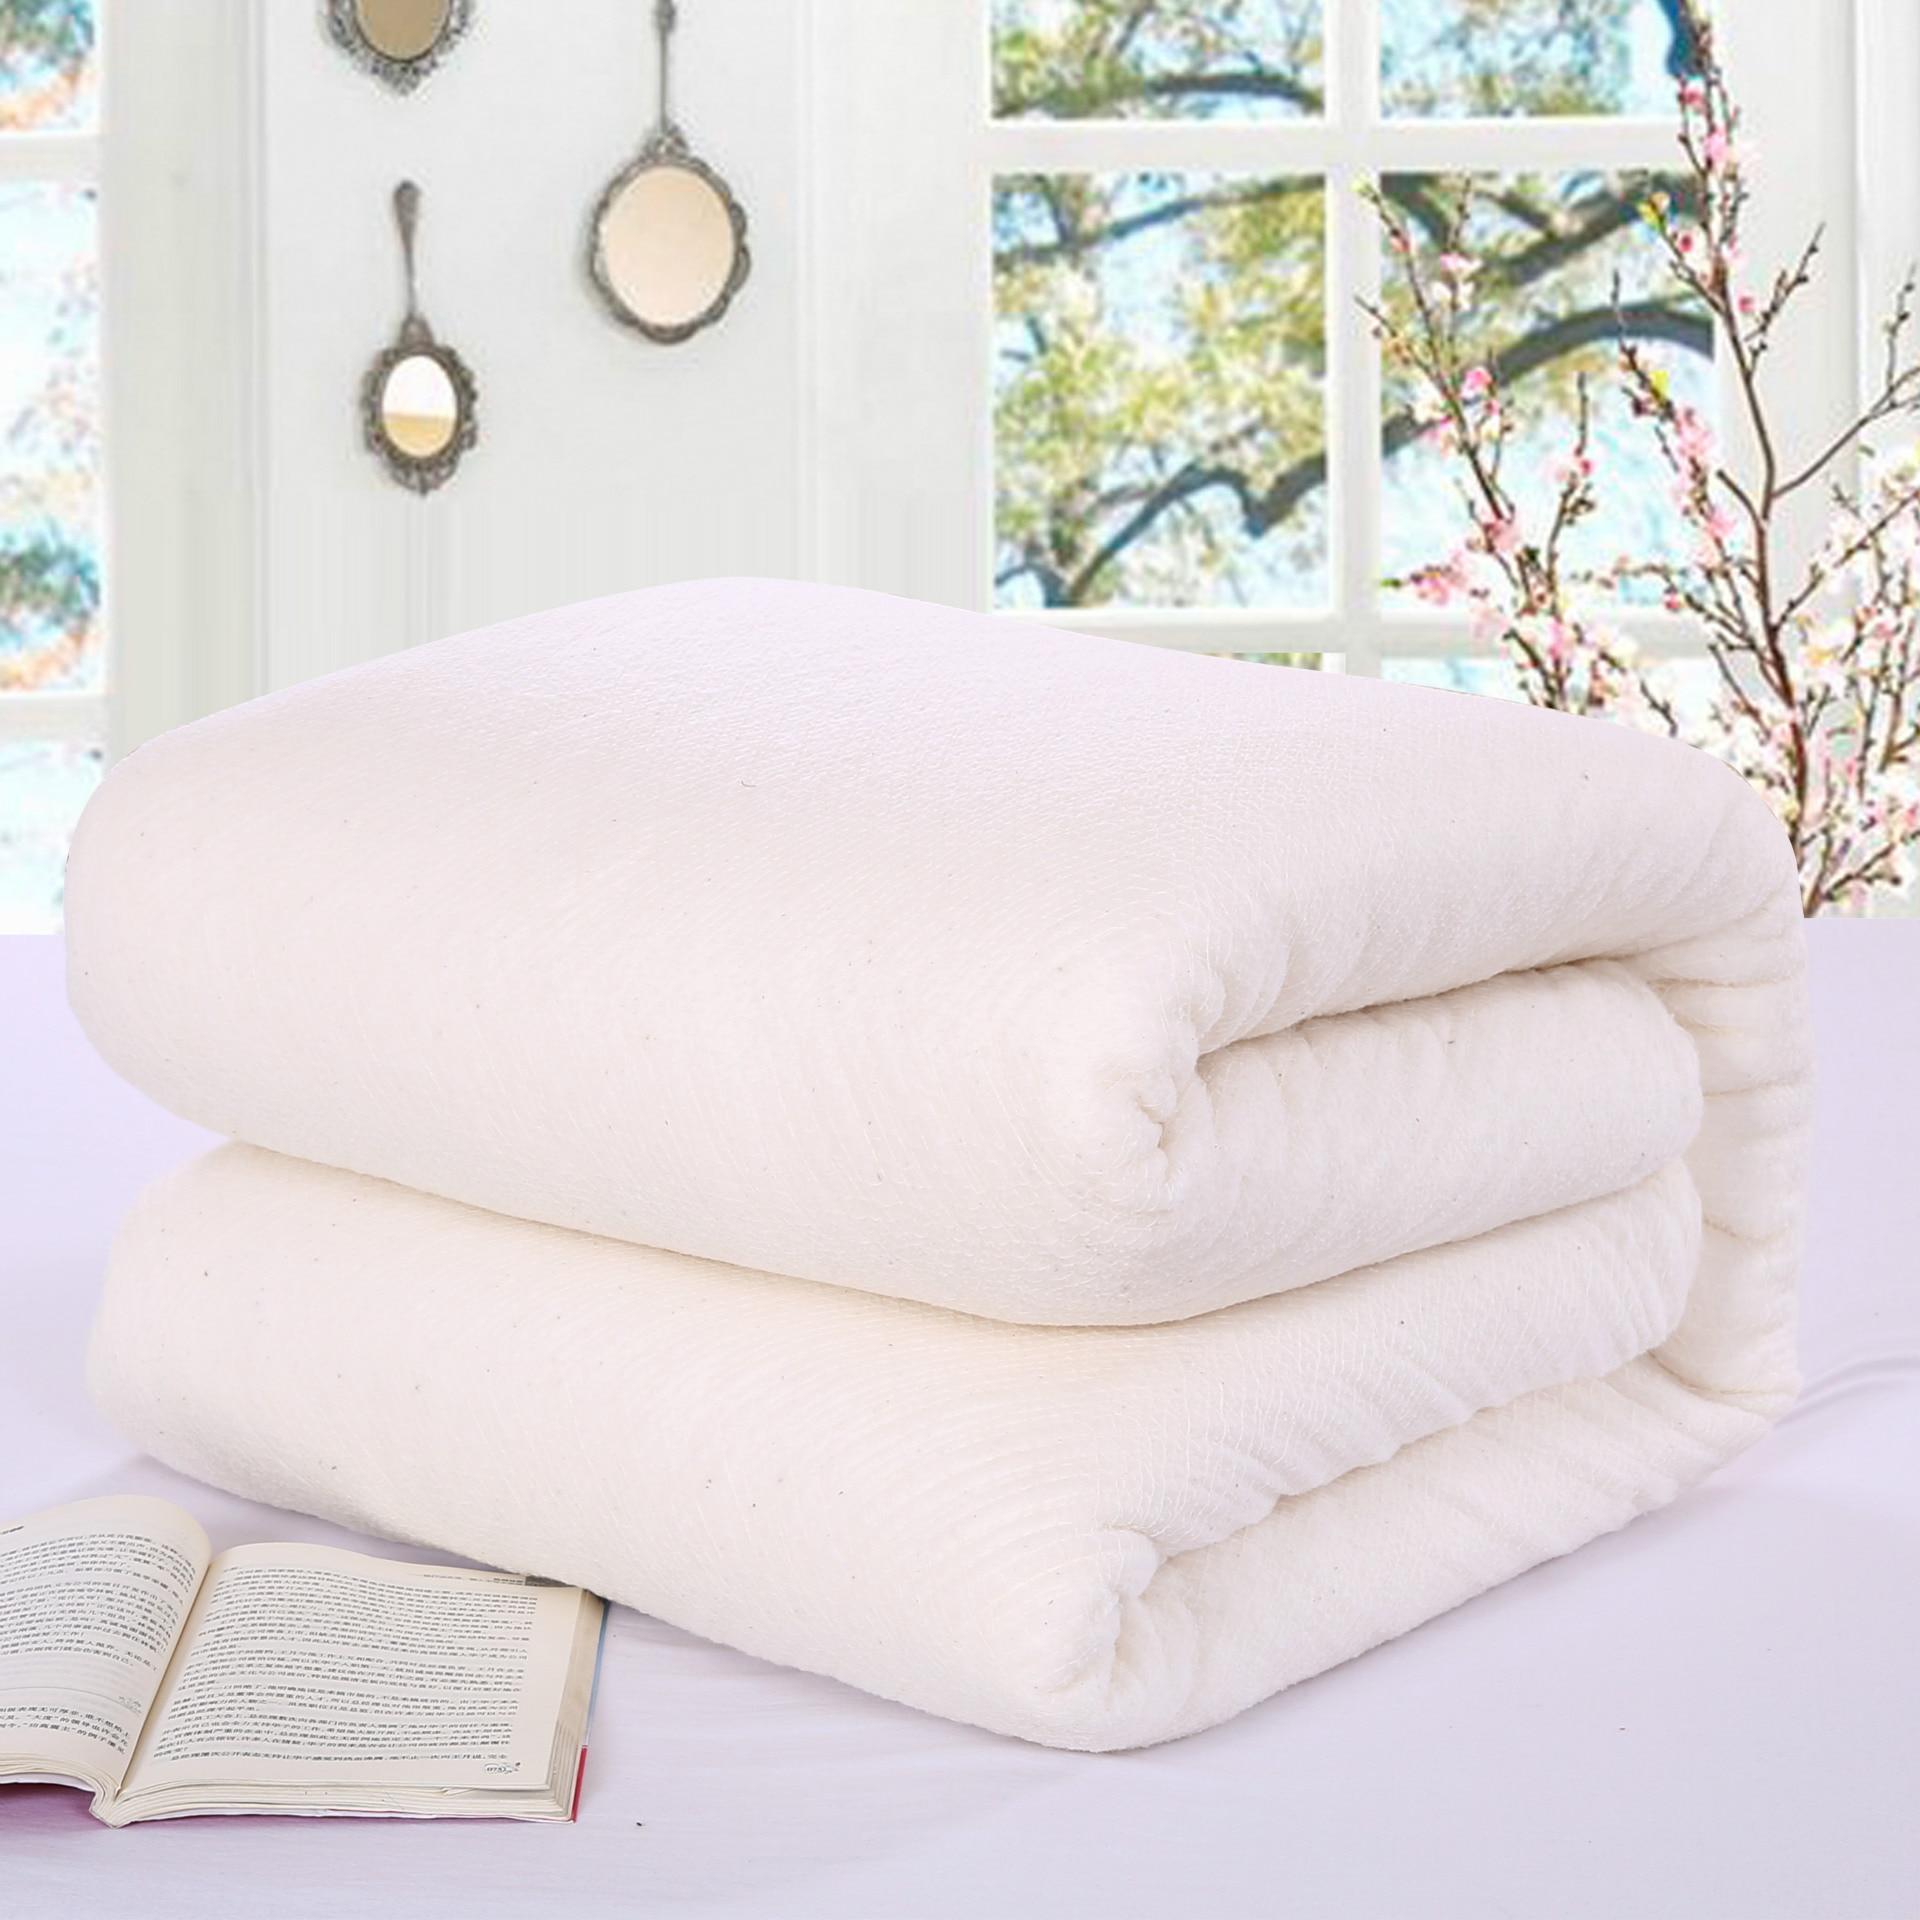 100% Cotton Duvets Quilted Futon Duvet Pure Plant Long Stable Fiber Comforters Non Irritating Hypoallergenic Warm Bedding Core